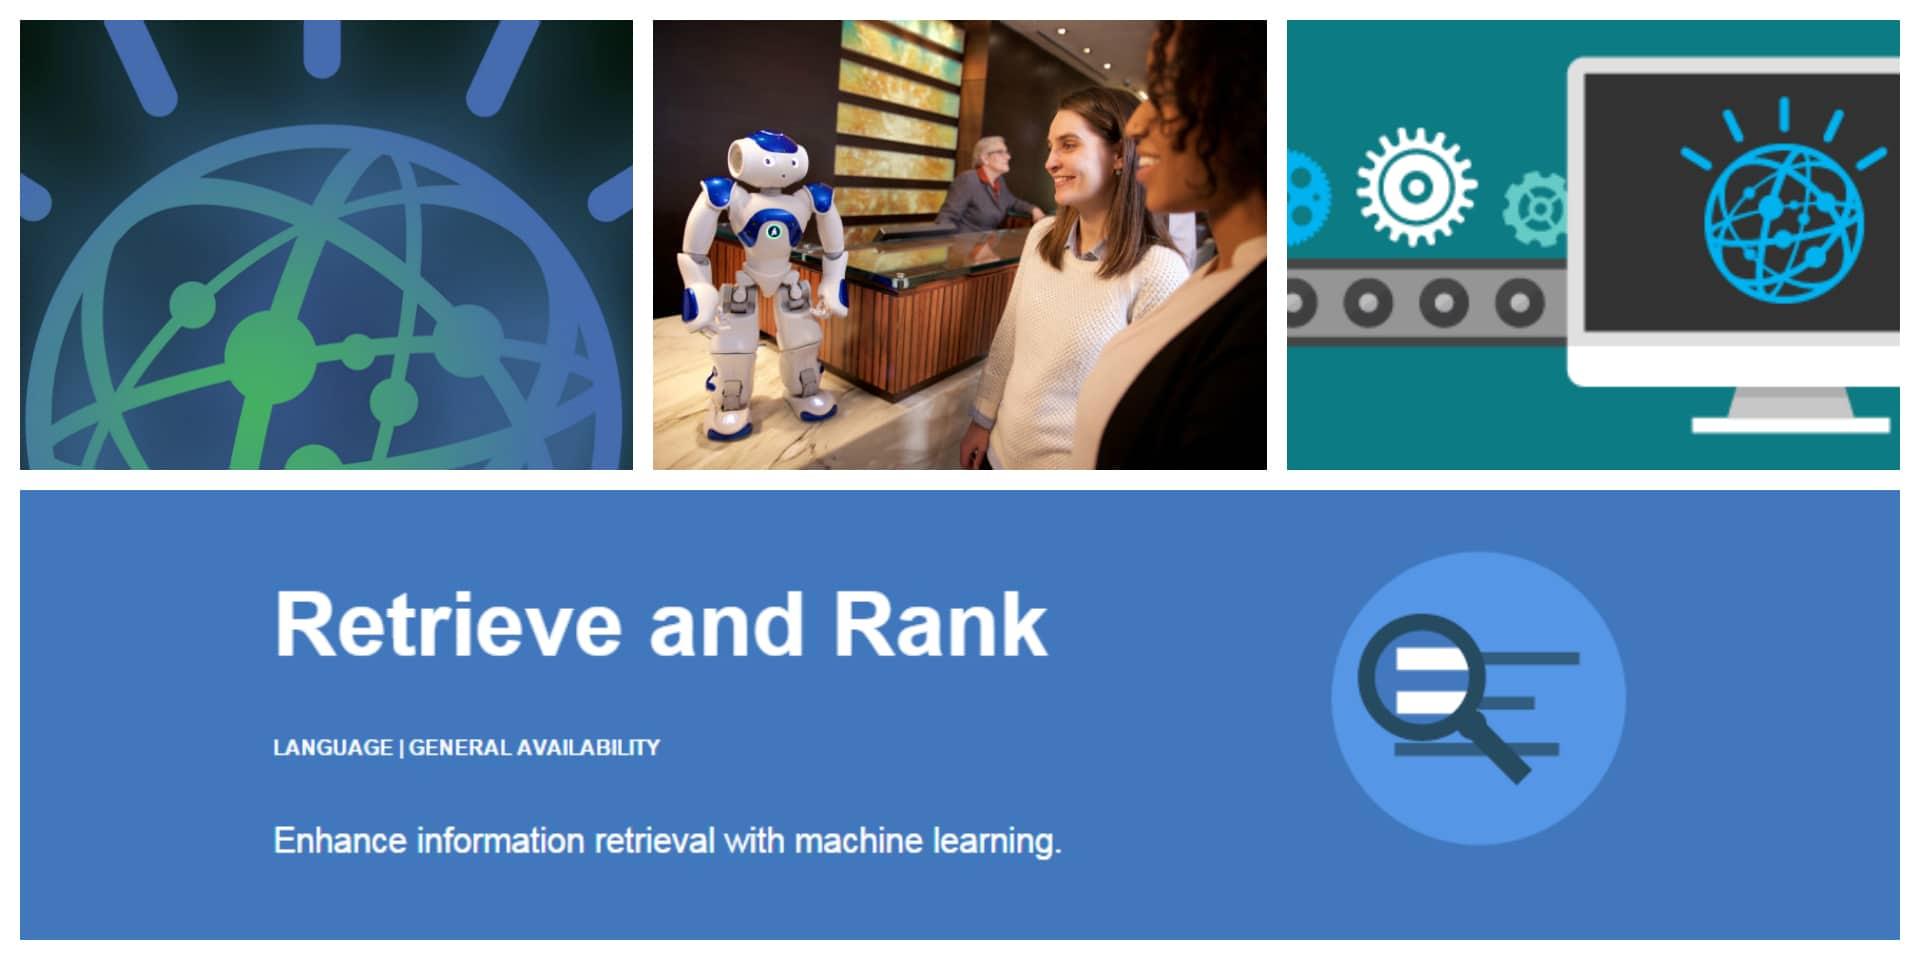 An introduction to IBM Watson Retrieve and Rank service